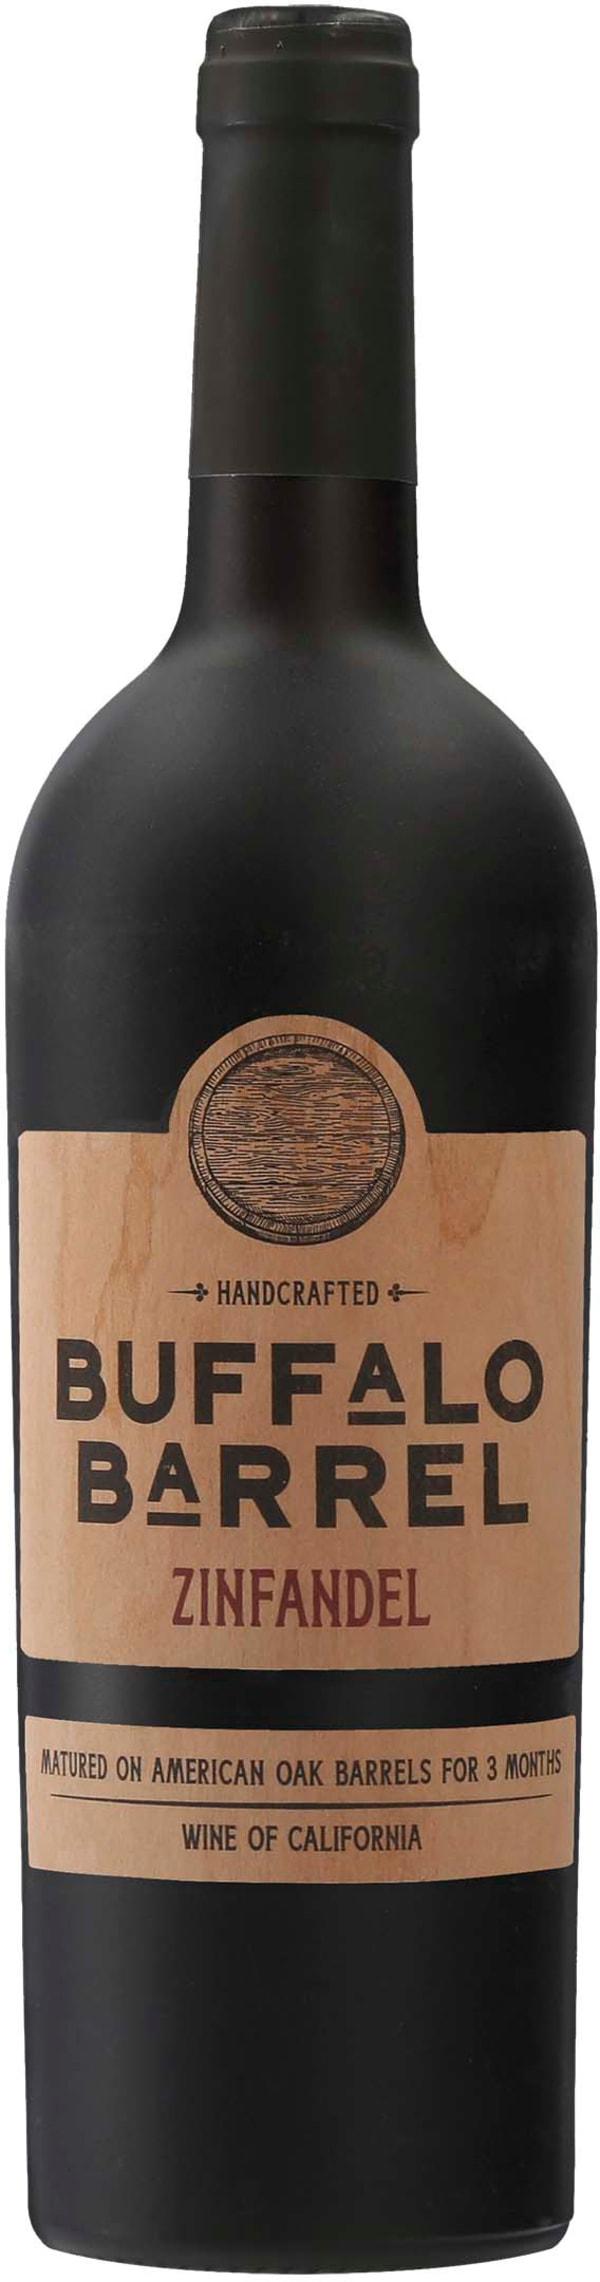 Buffalo Barrel Bourbon Barrel Aged Zinfandel 2017